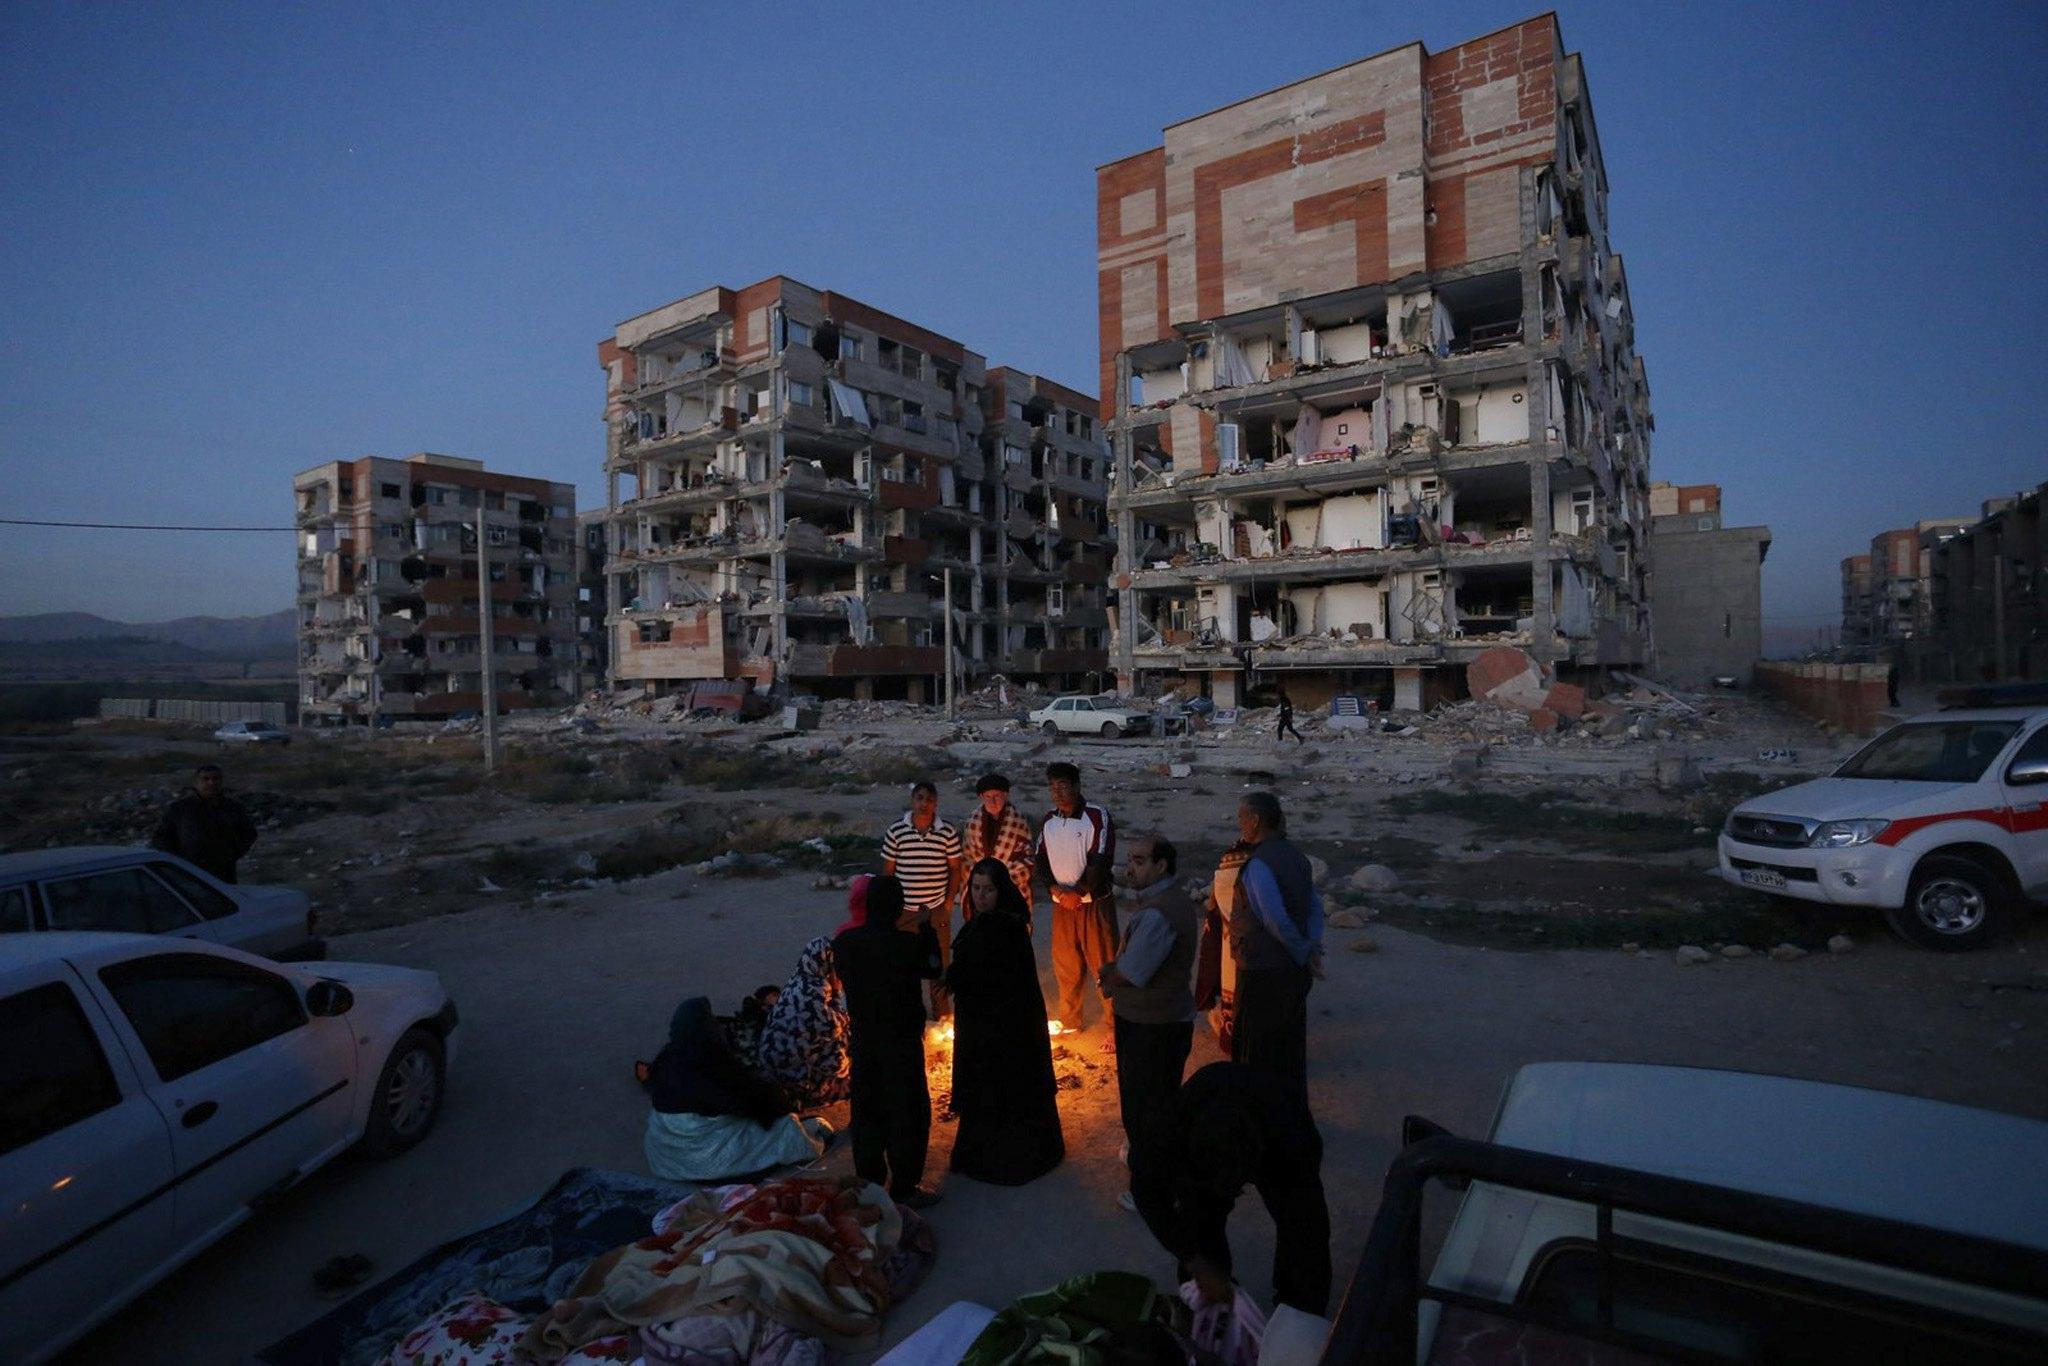 7.2 magnitude earthquake hits region along the border between Iran and Iraq